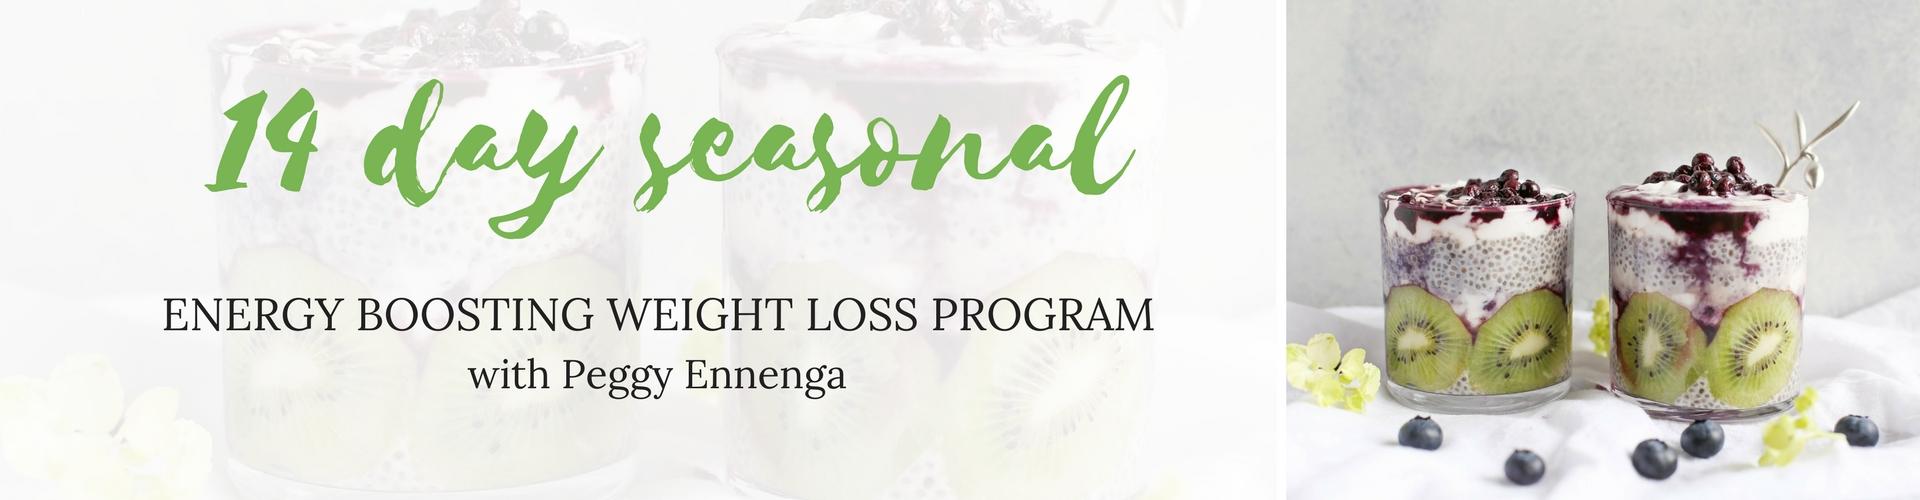 14 Day Seasonal Energy Boosting Weight Loss Program